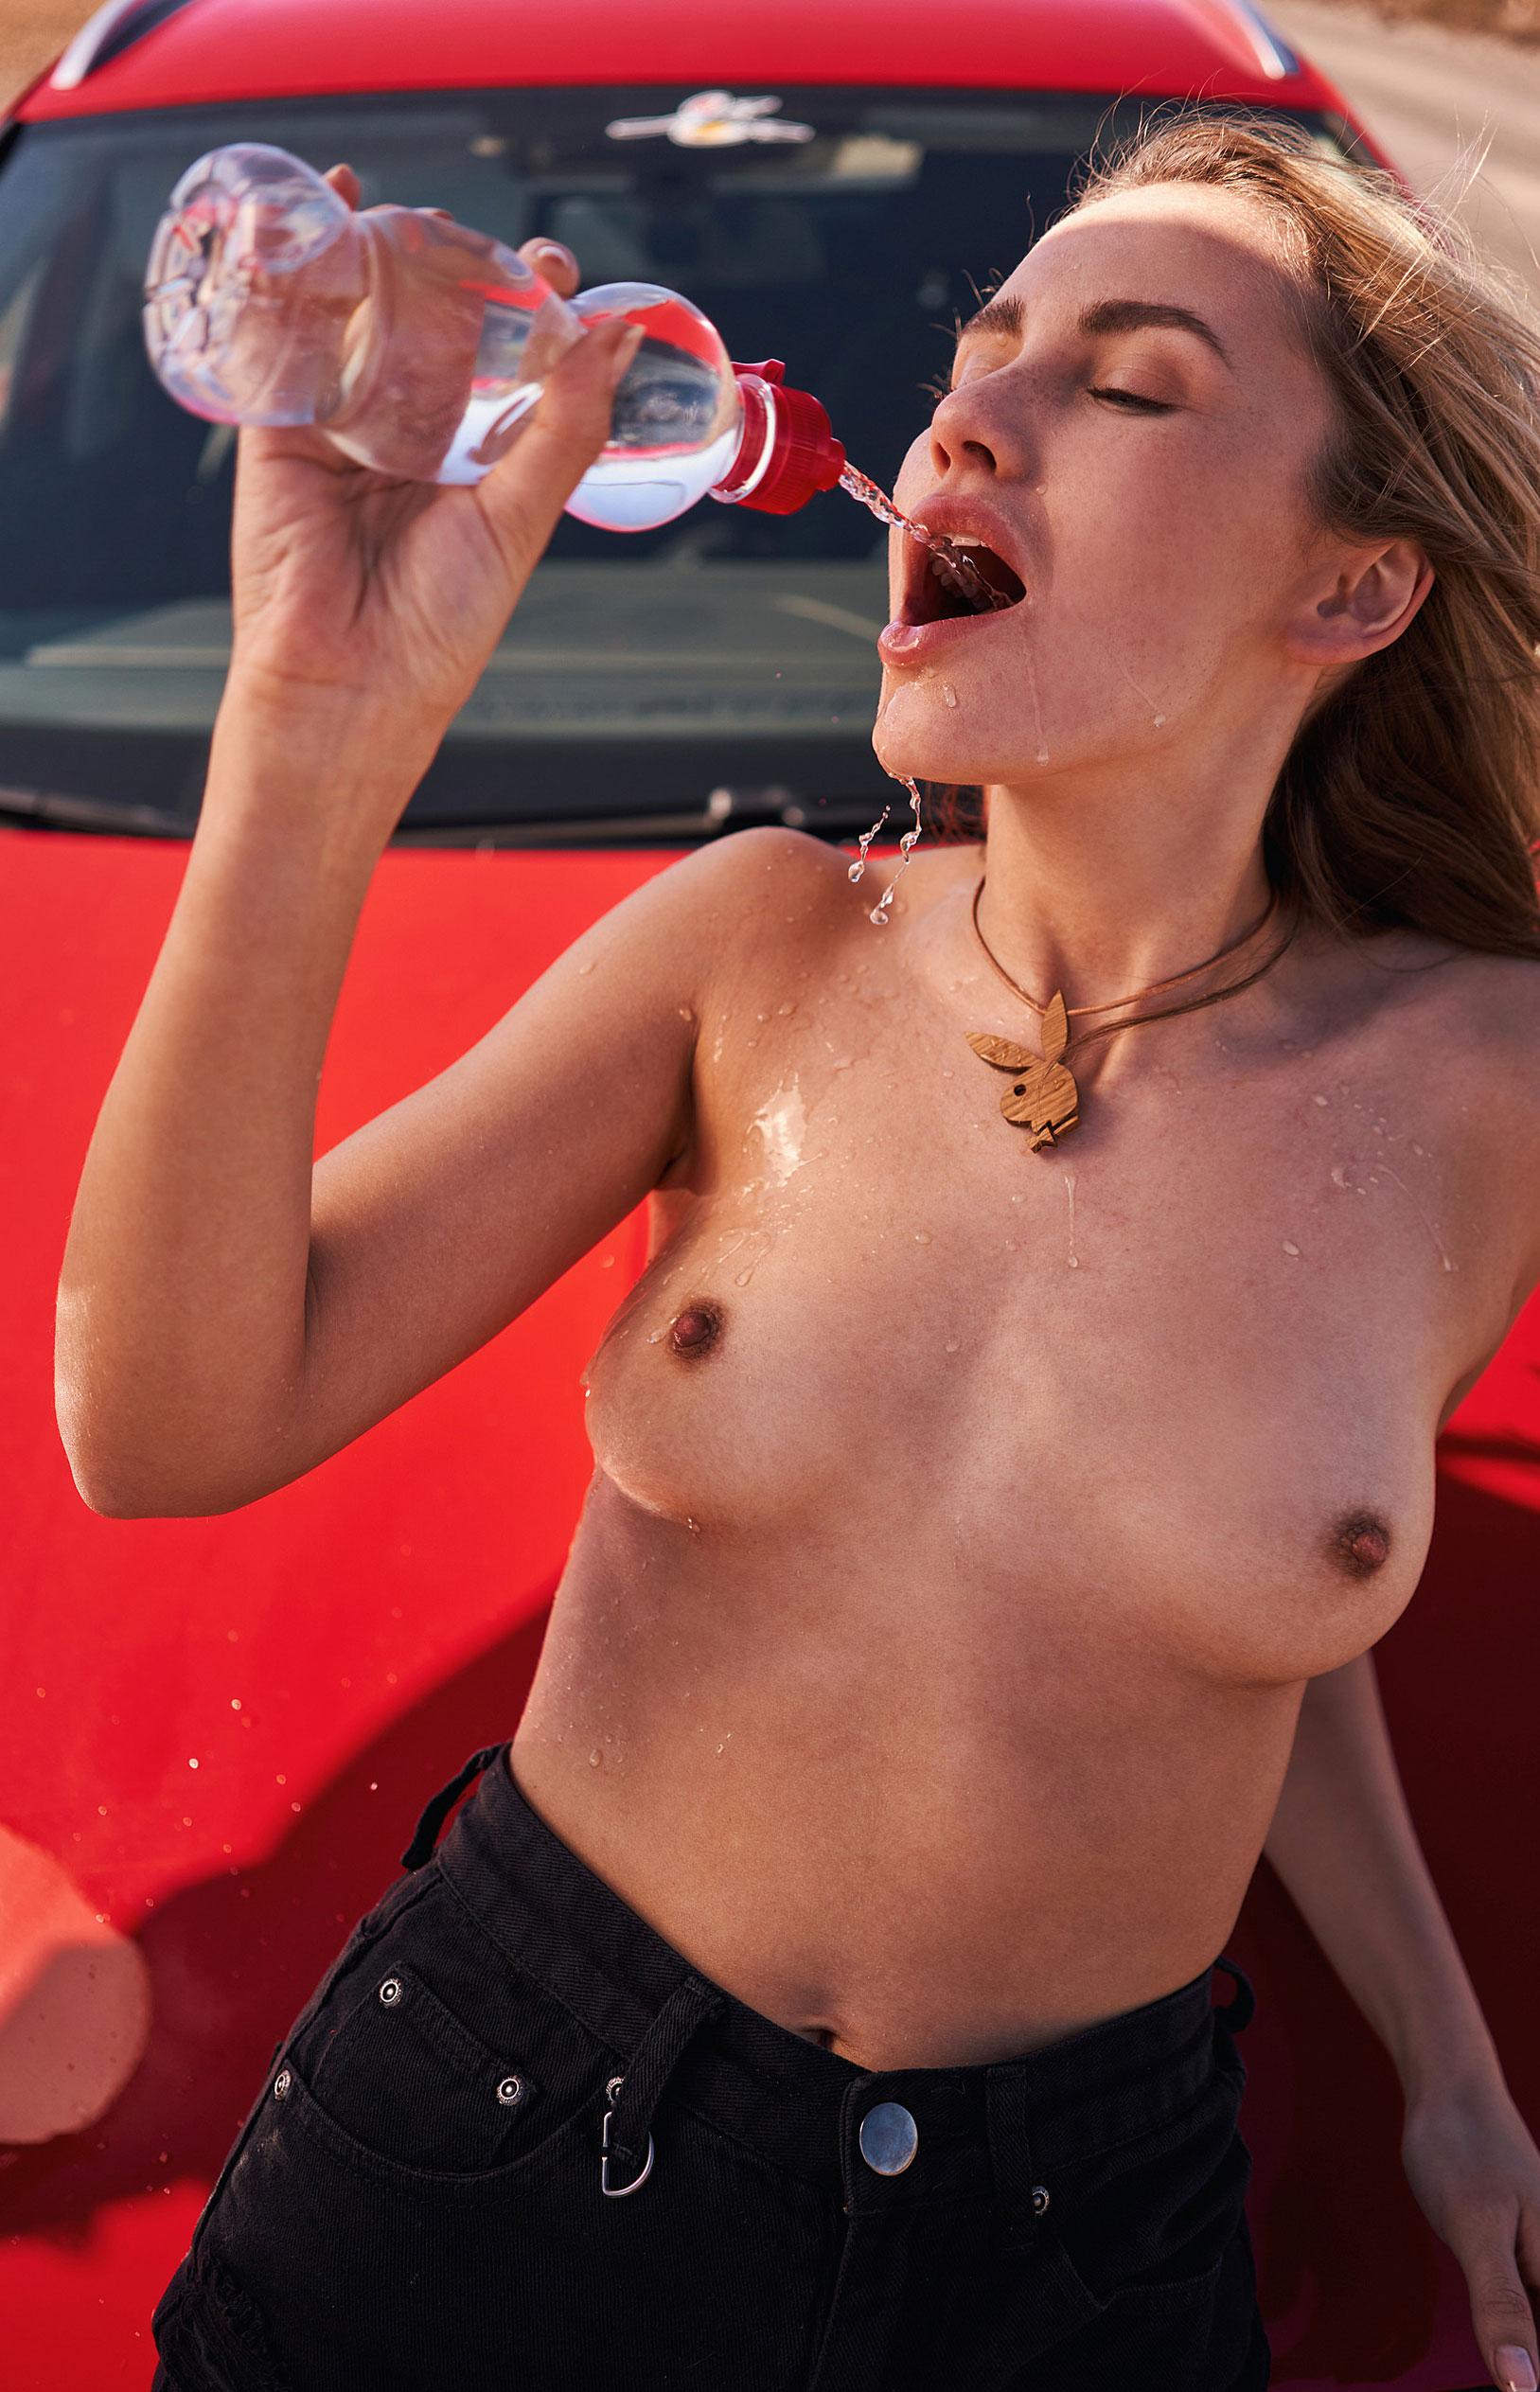 Девушка месяца немецкого Playboy Джессика Уитман / фото 23